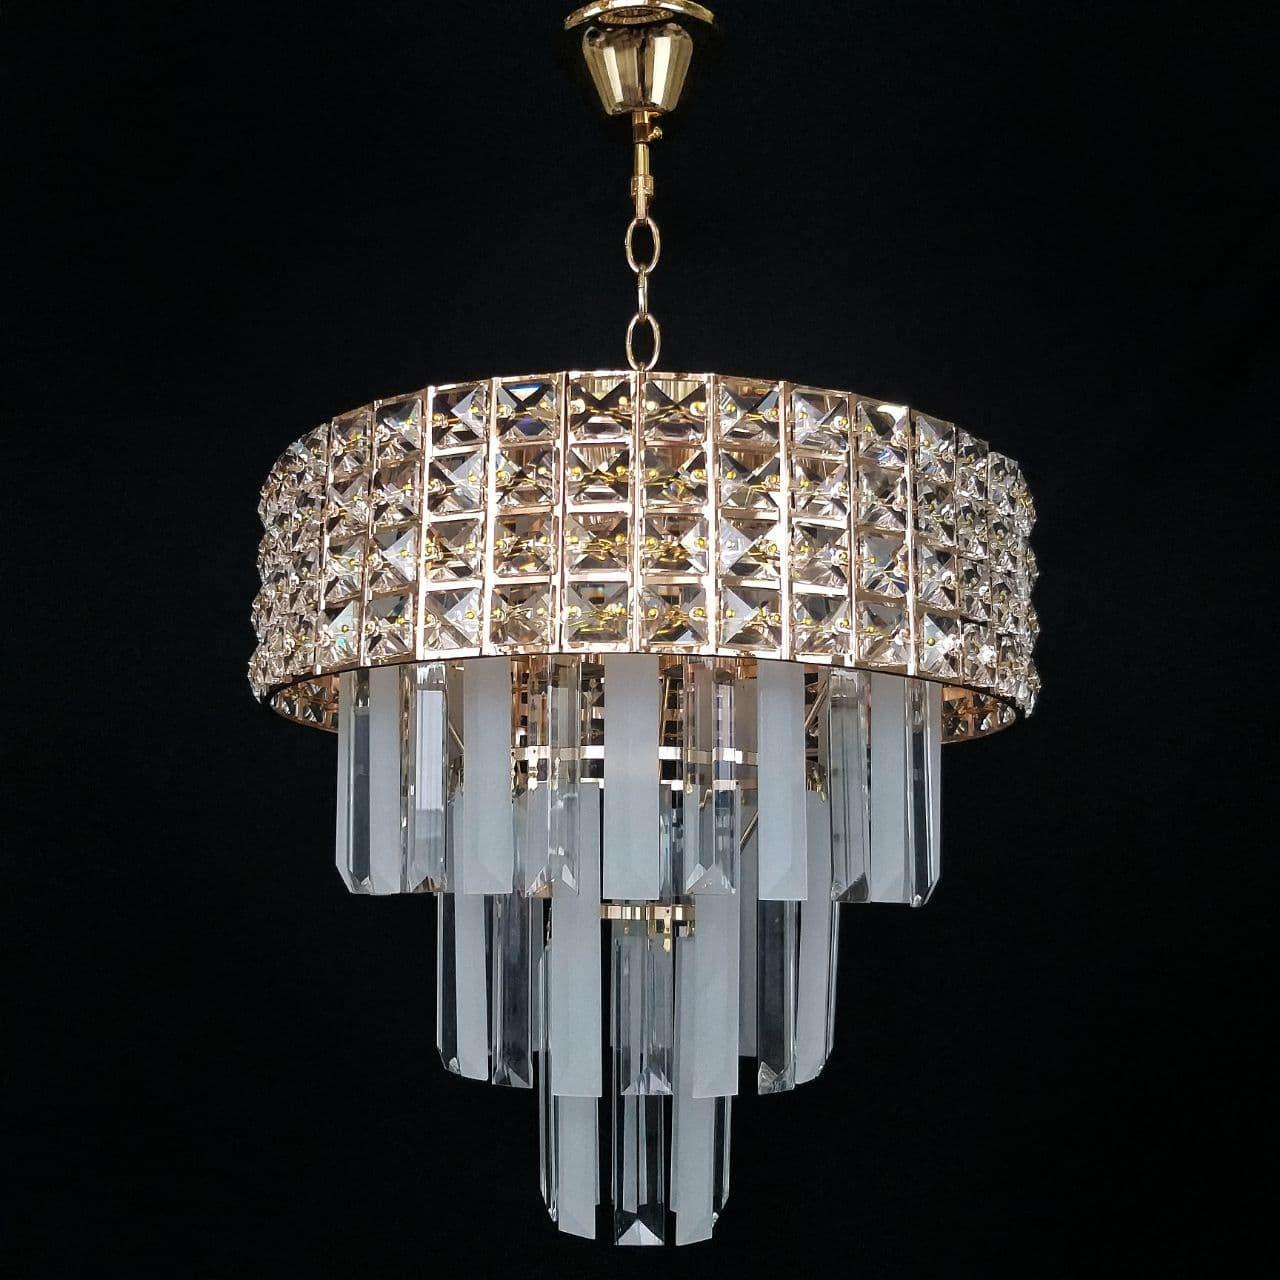 Люстра хрустальная в золоте на 8 лампочек 3-E1859/8